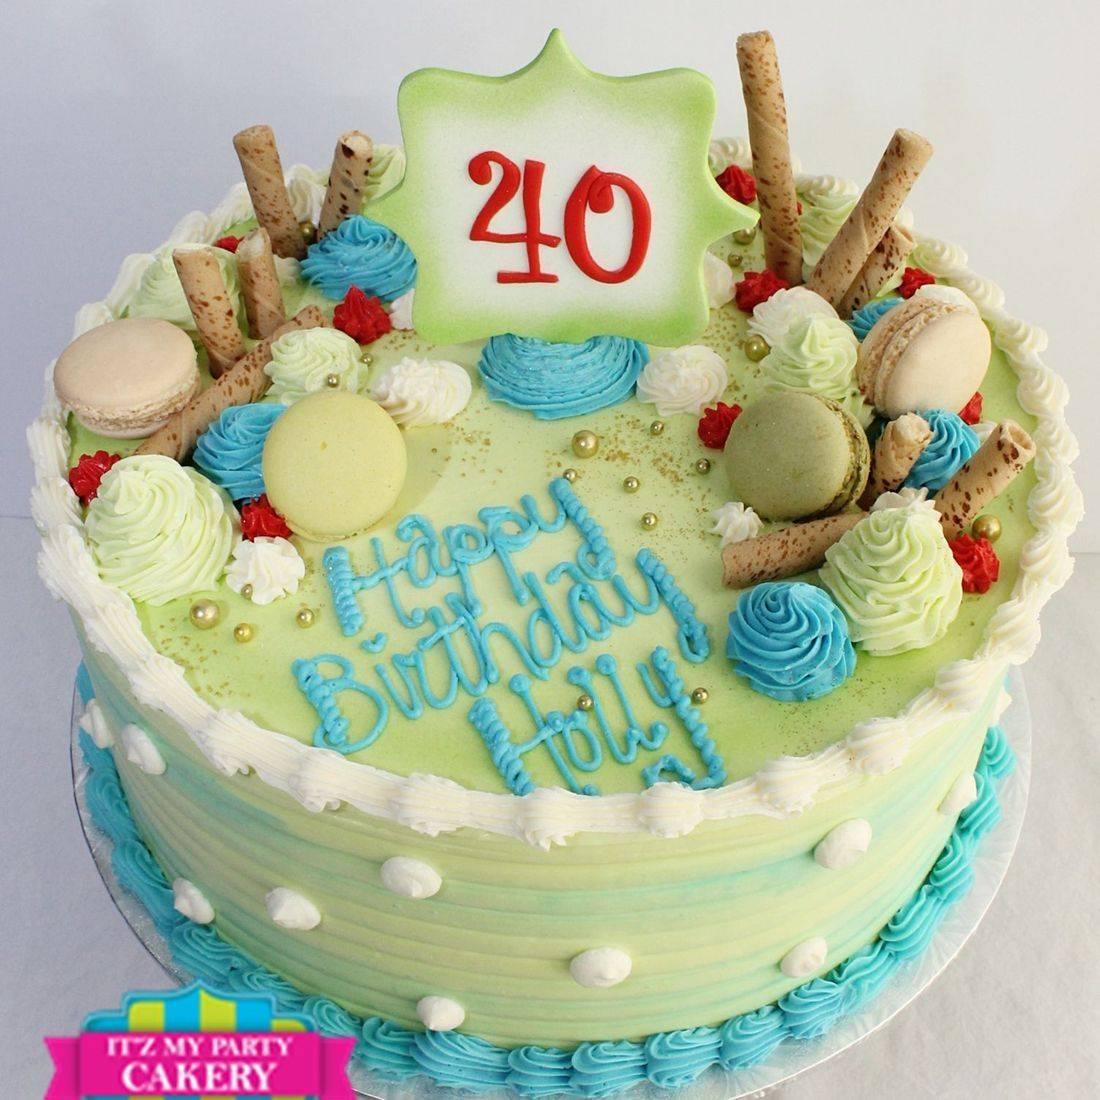 40 years old stylized cakes milwaukee